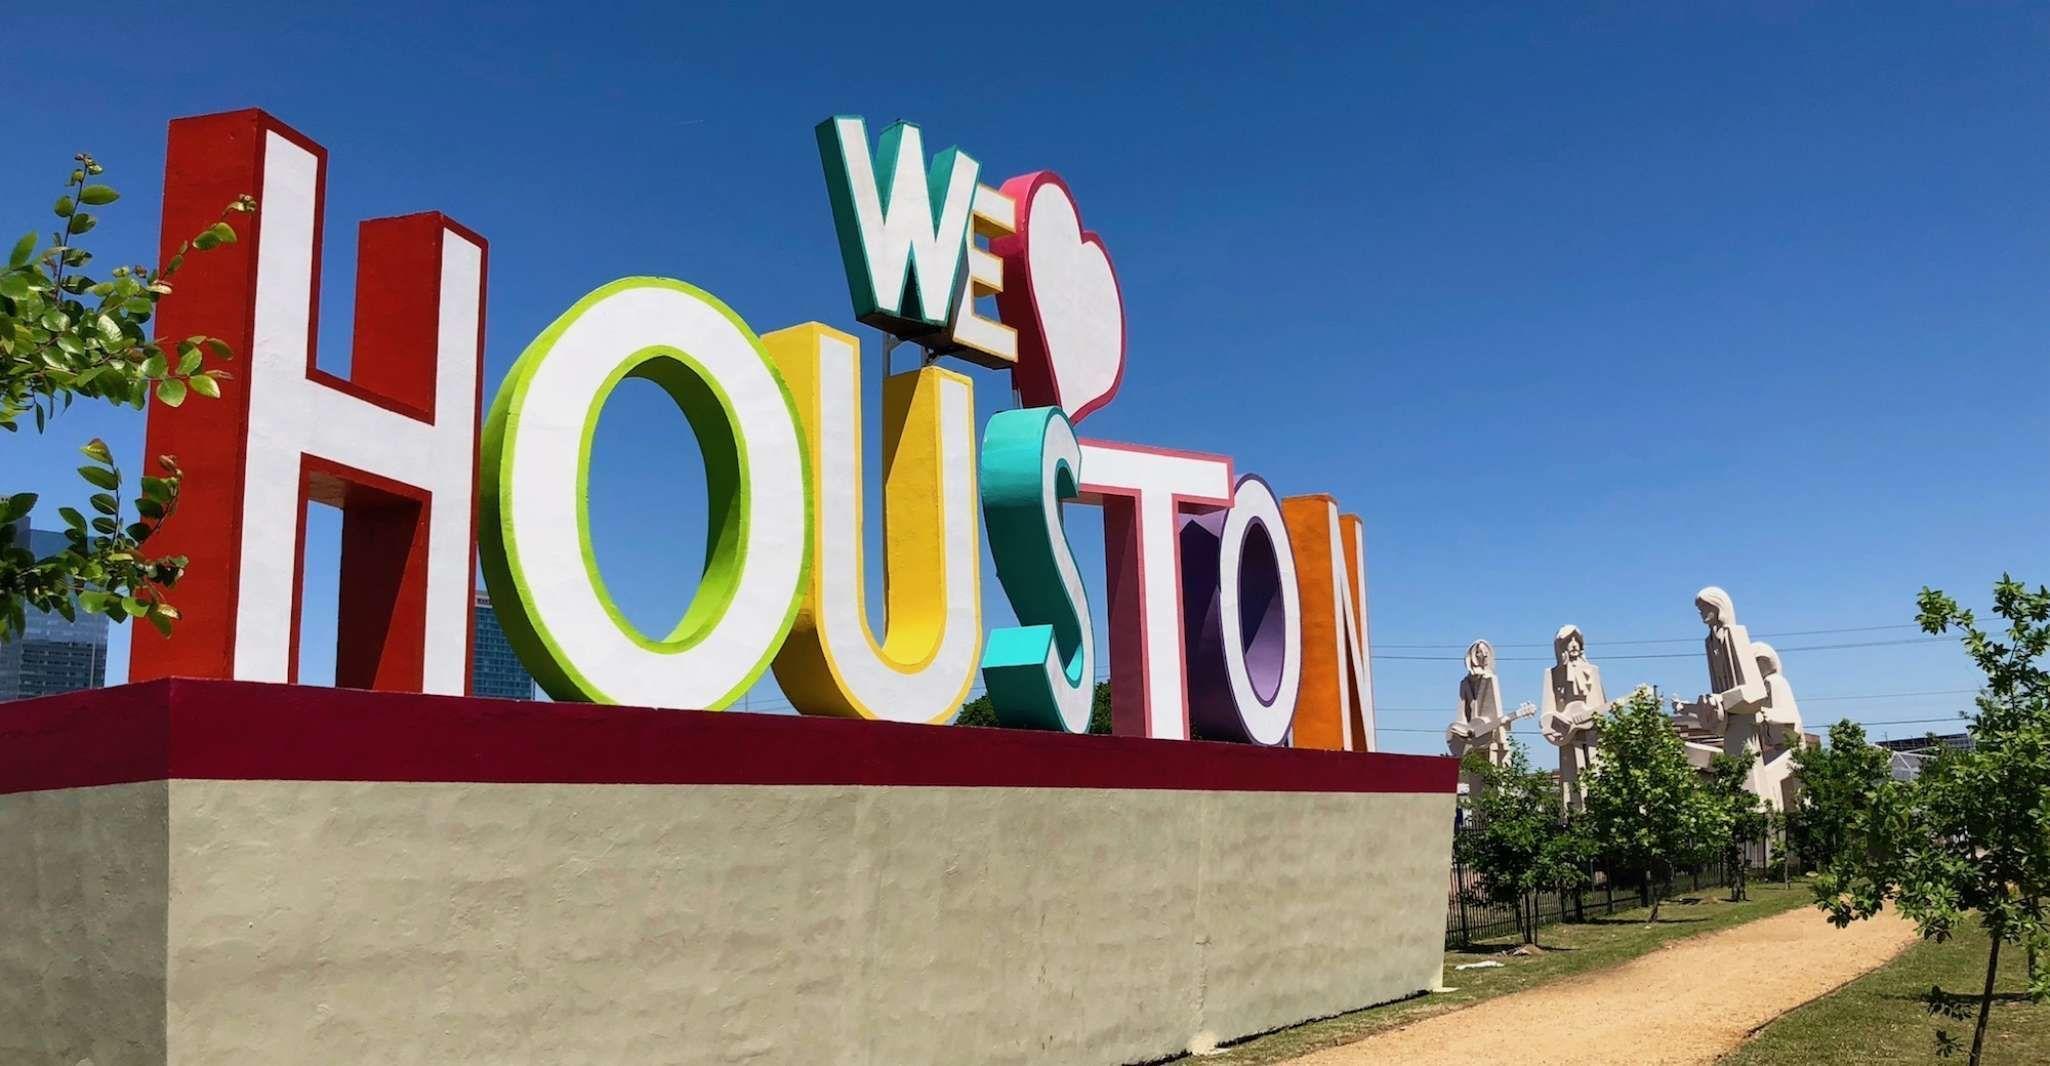 Houston Hop on-City Tour: 2-Day Pass